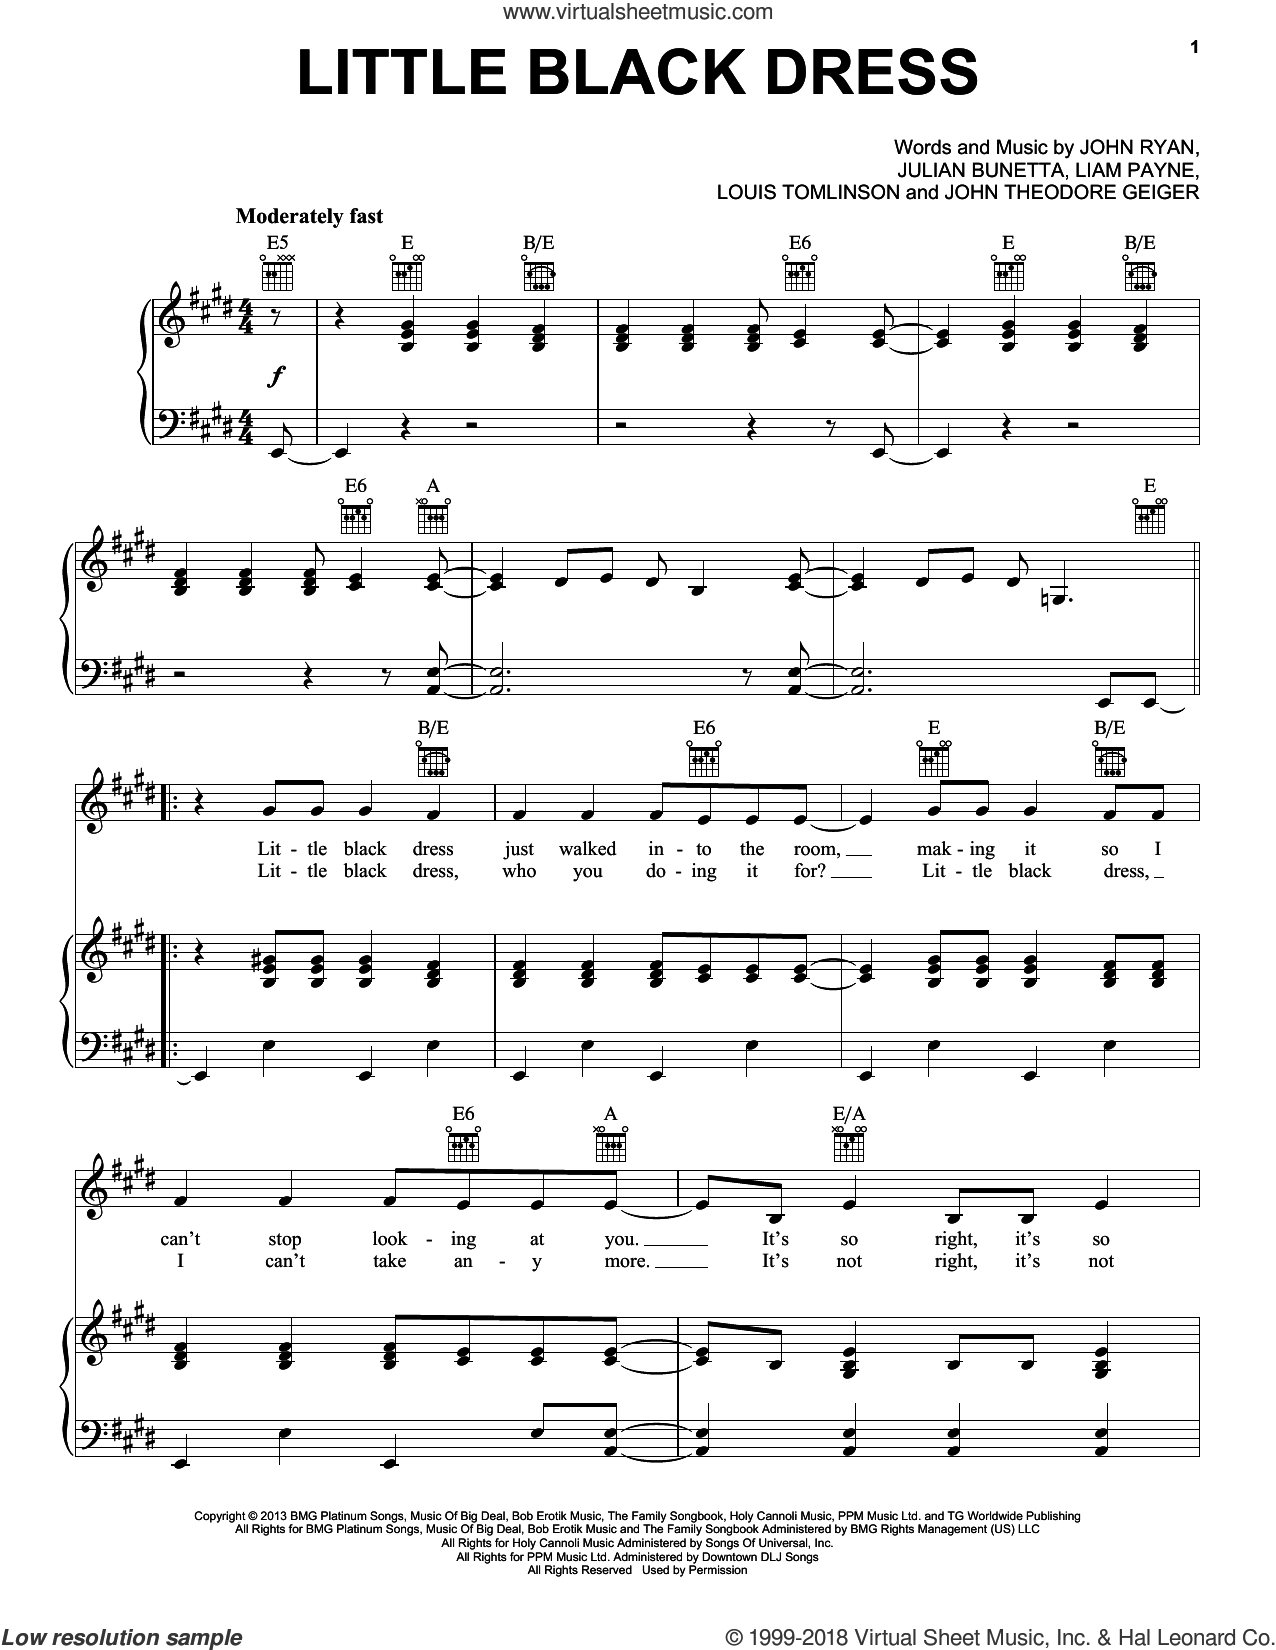 Little Black Dress sheet music for voice, piano or guitar by One Direction, John Ryan, John Theodore Geiger, Julian Bunetta, Liam Payne and Louis Tomlinson, intermediate skill level